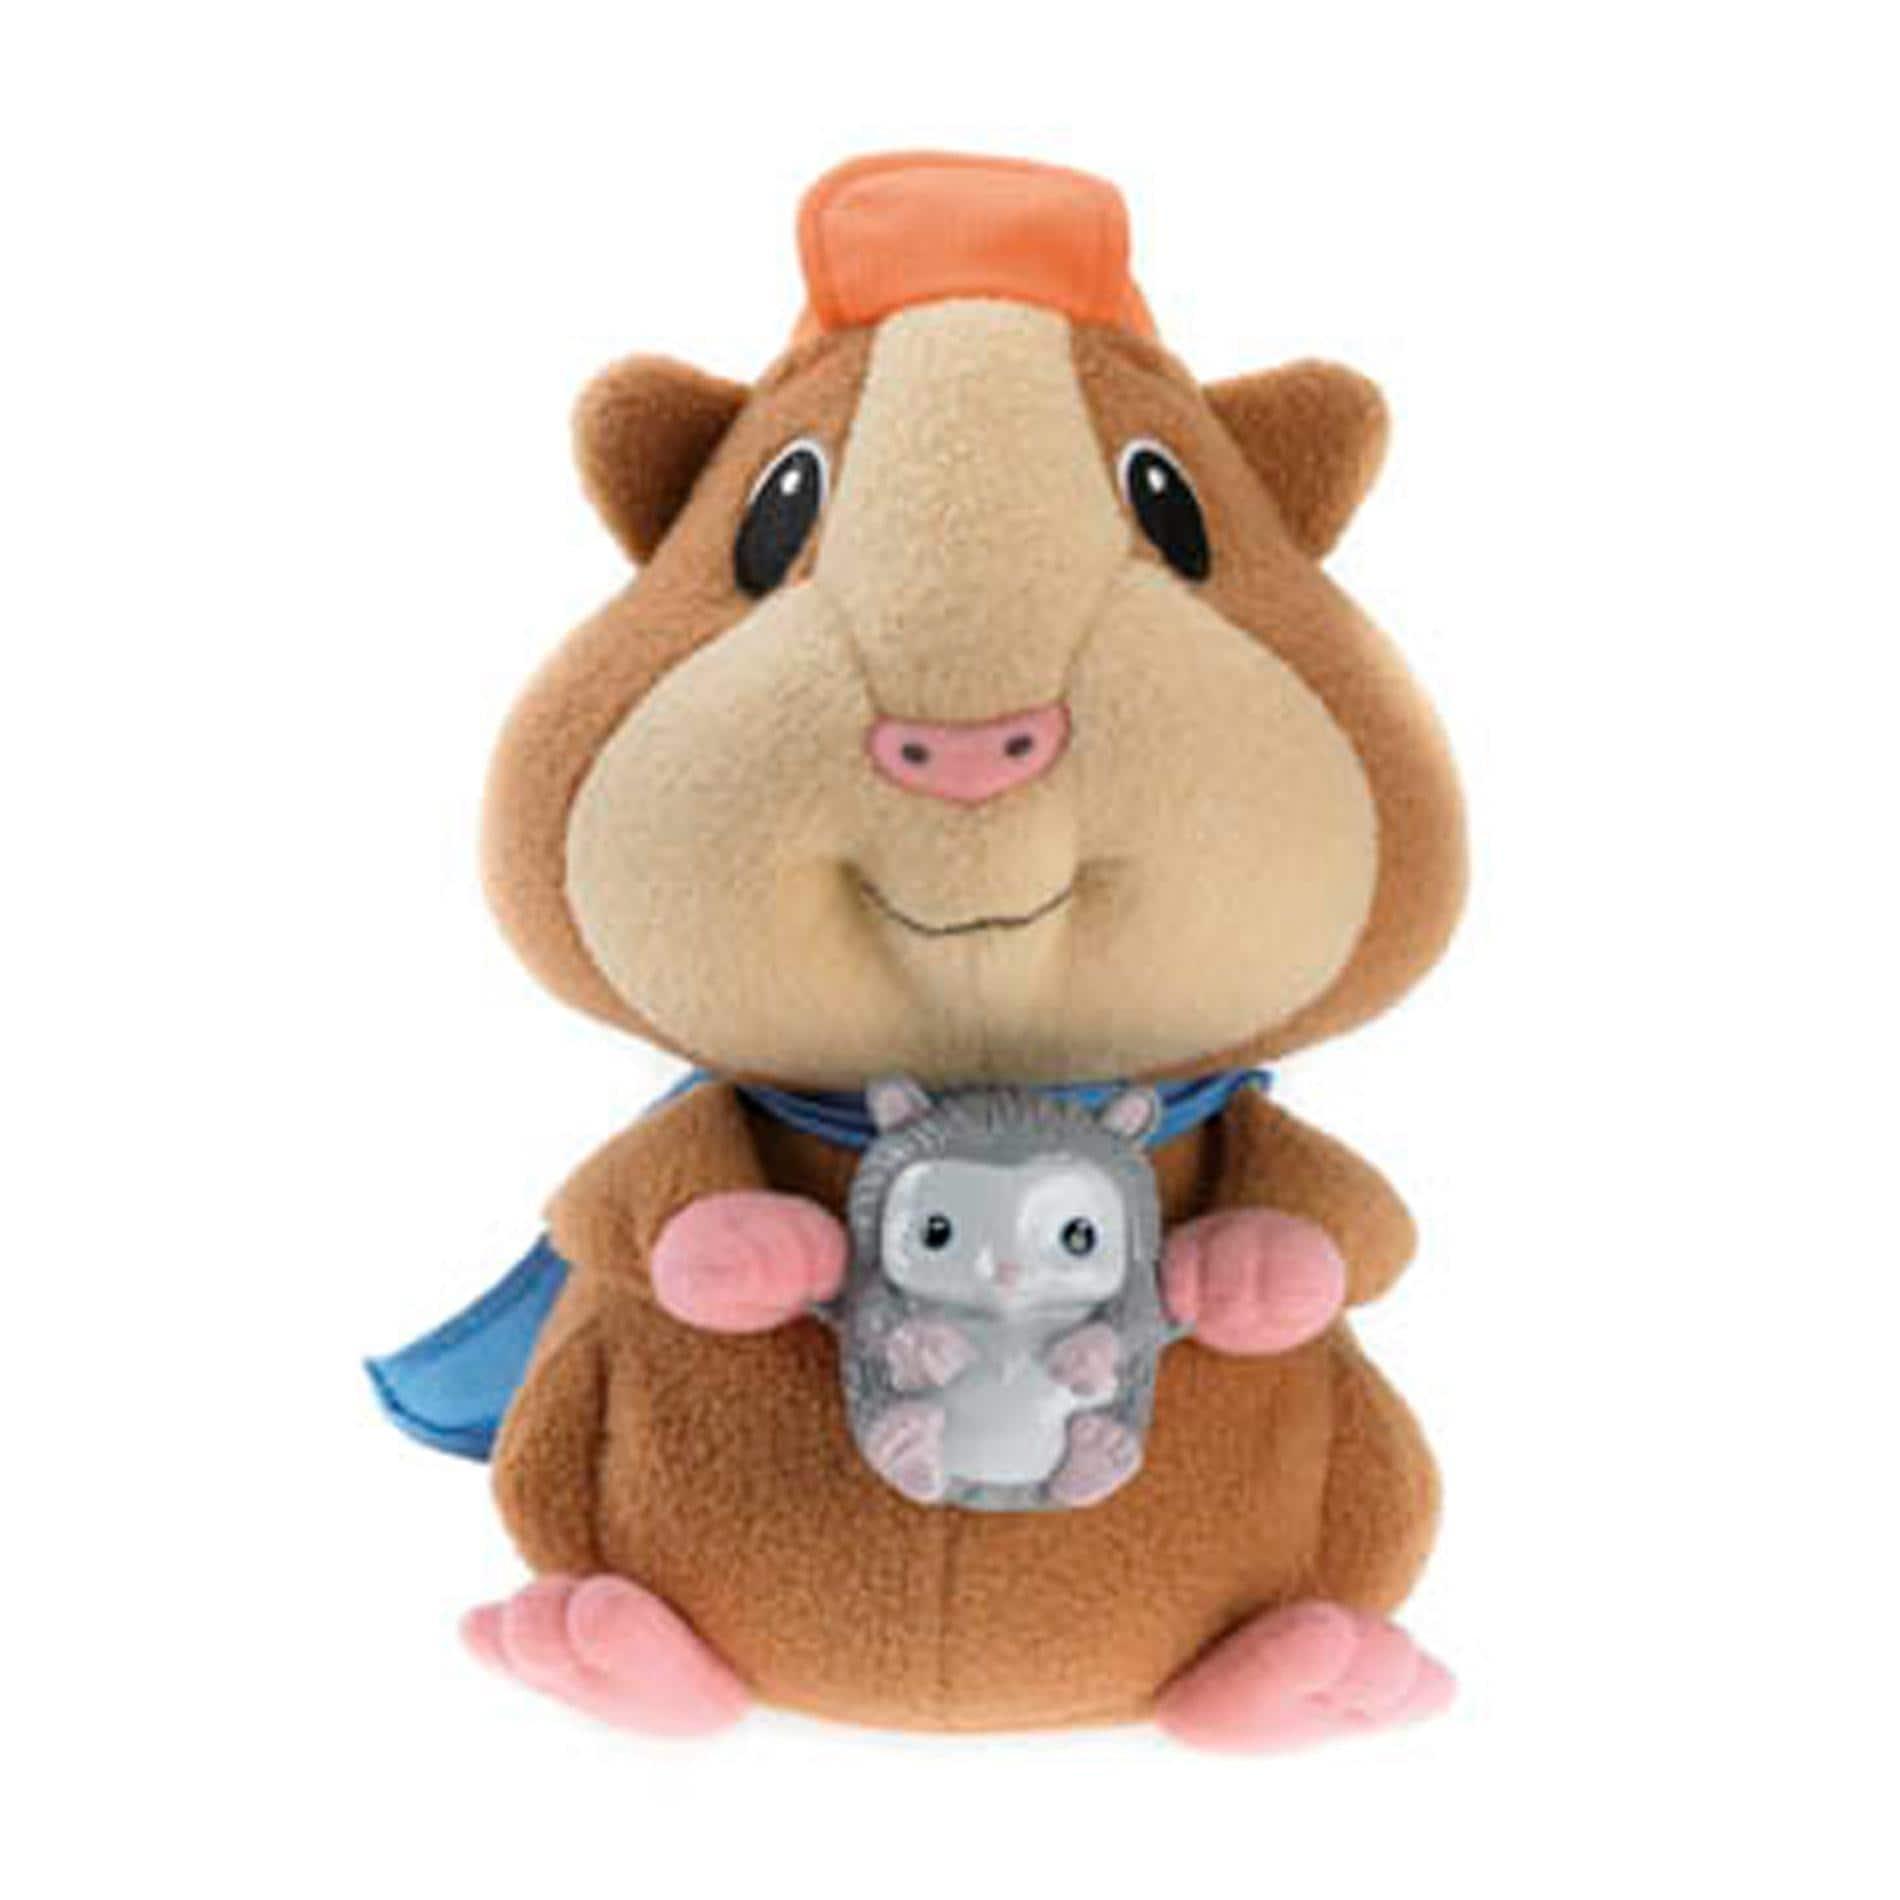 Fisher Price Wonder Pets 'Linny' Plush Toy